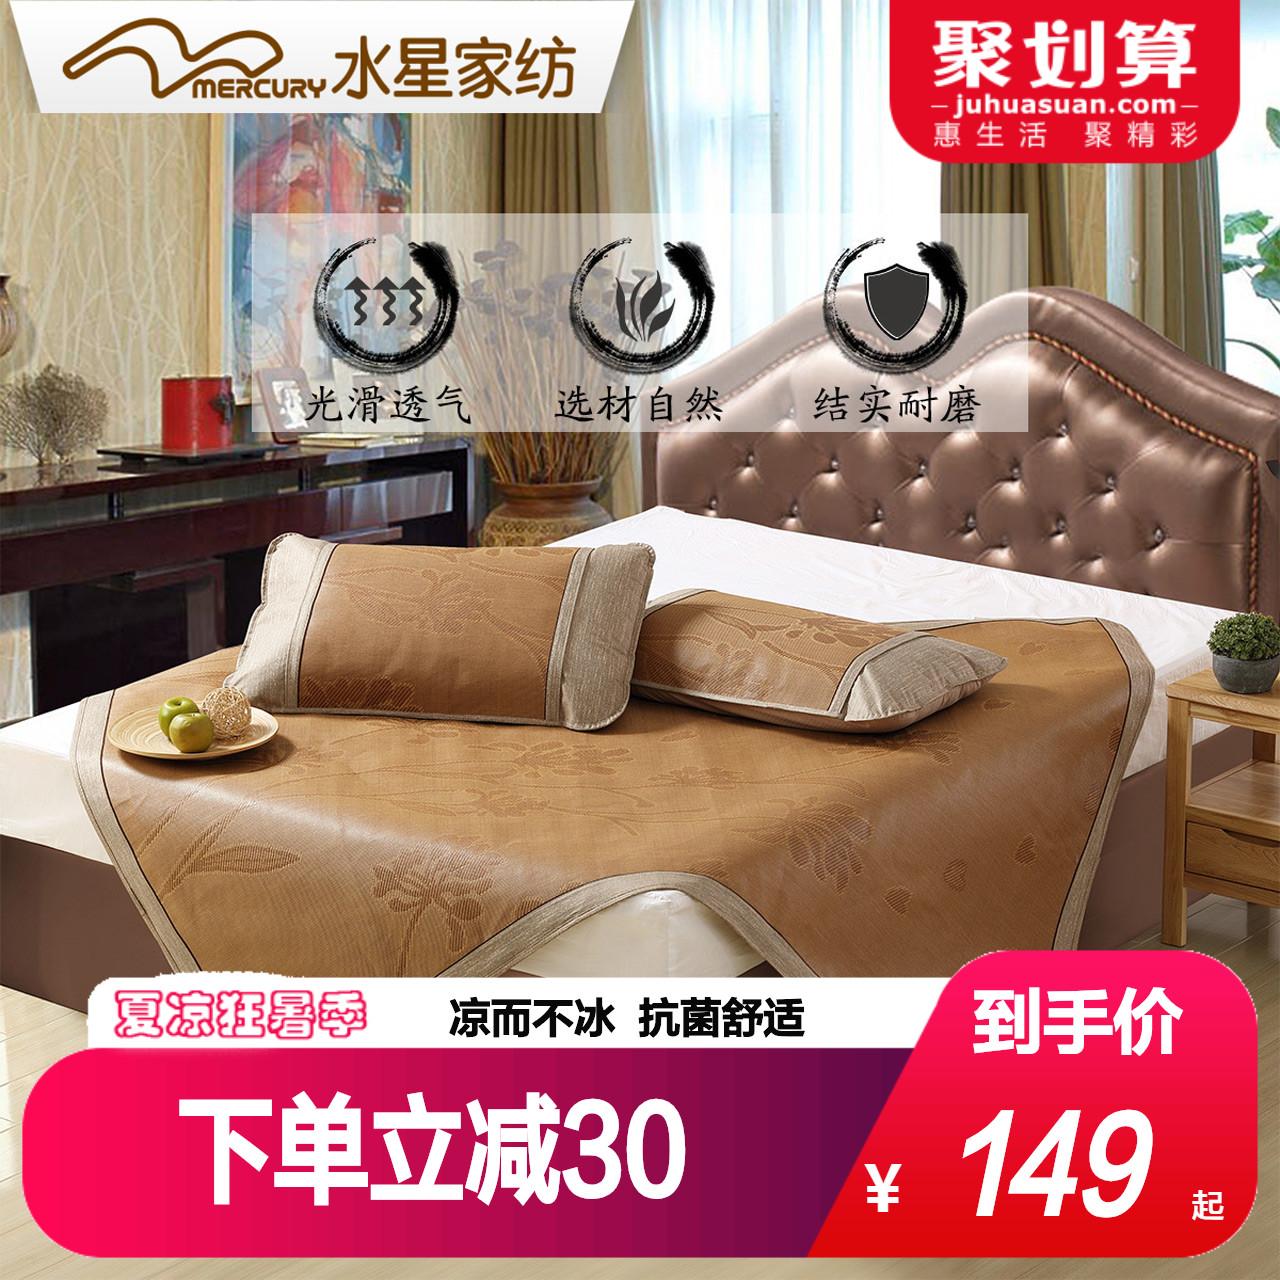 Декоративные одеяла и подушки / Прикроватные коврики Артикул 564888537894